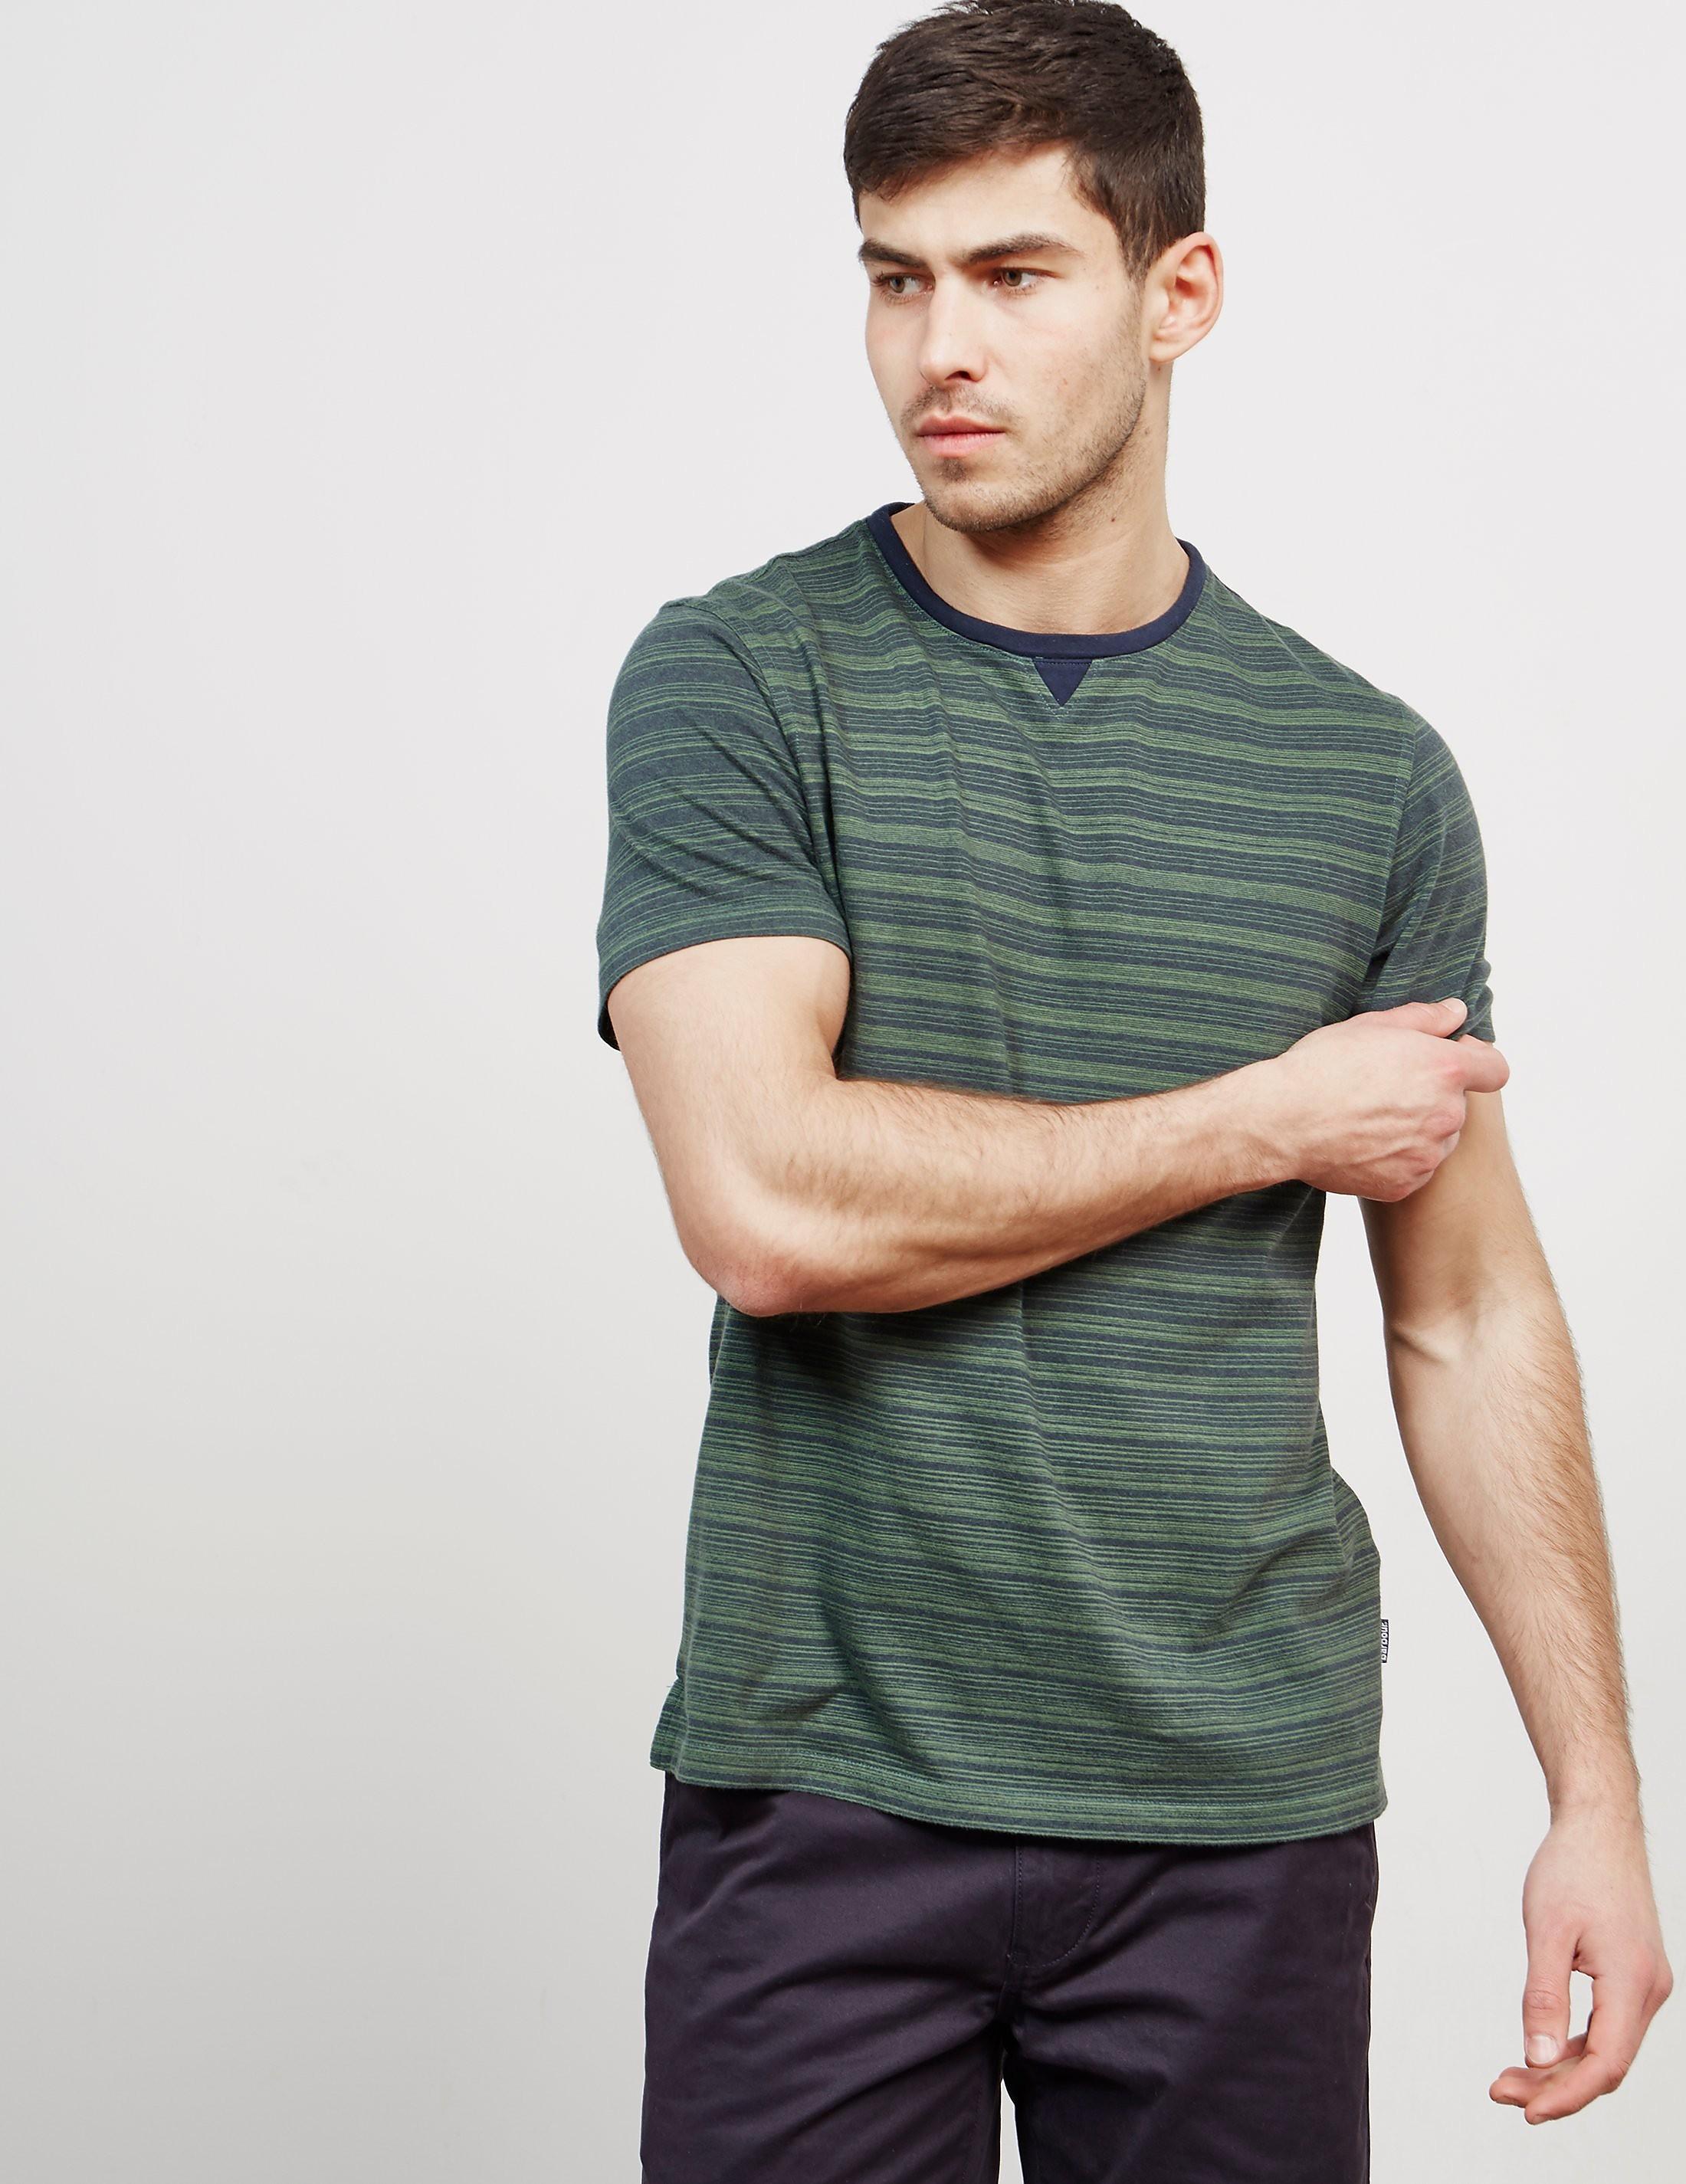 Barbour Mako Stripe Short Sleeve T-Shirt